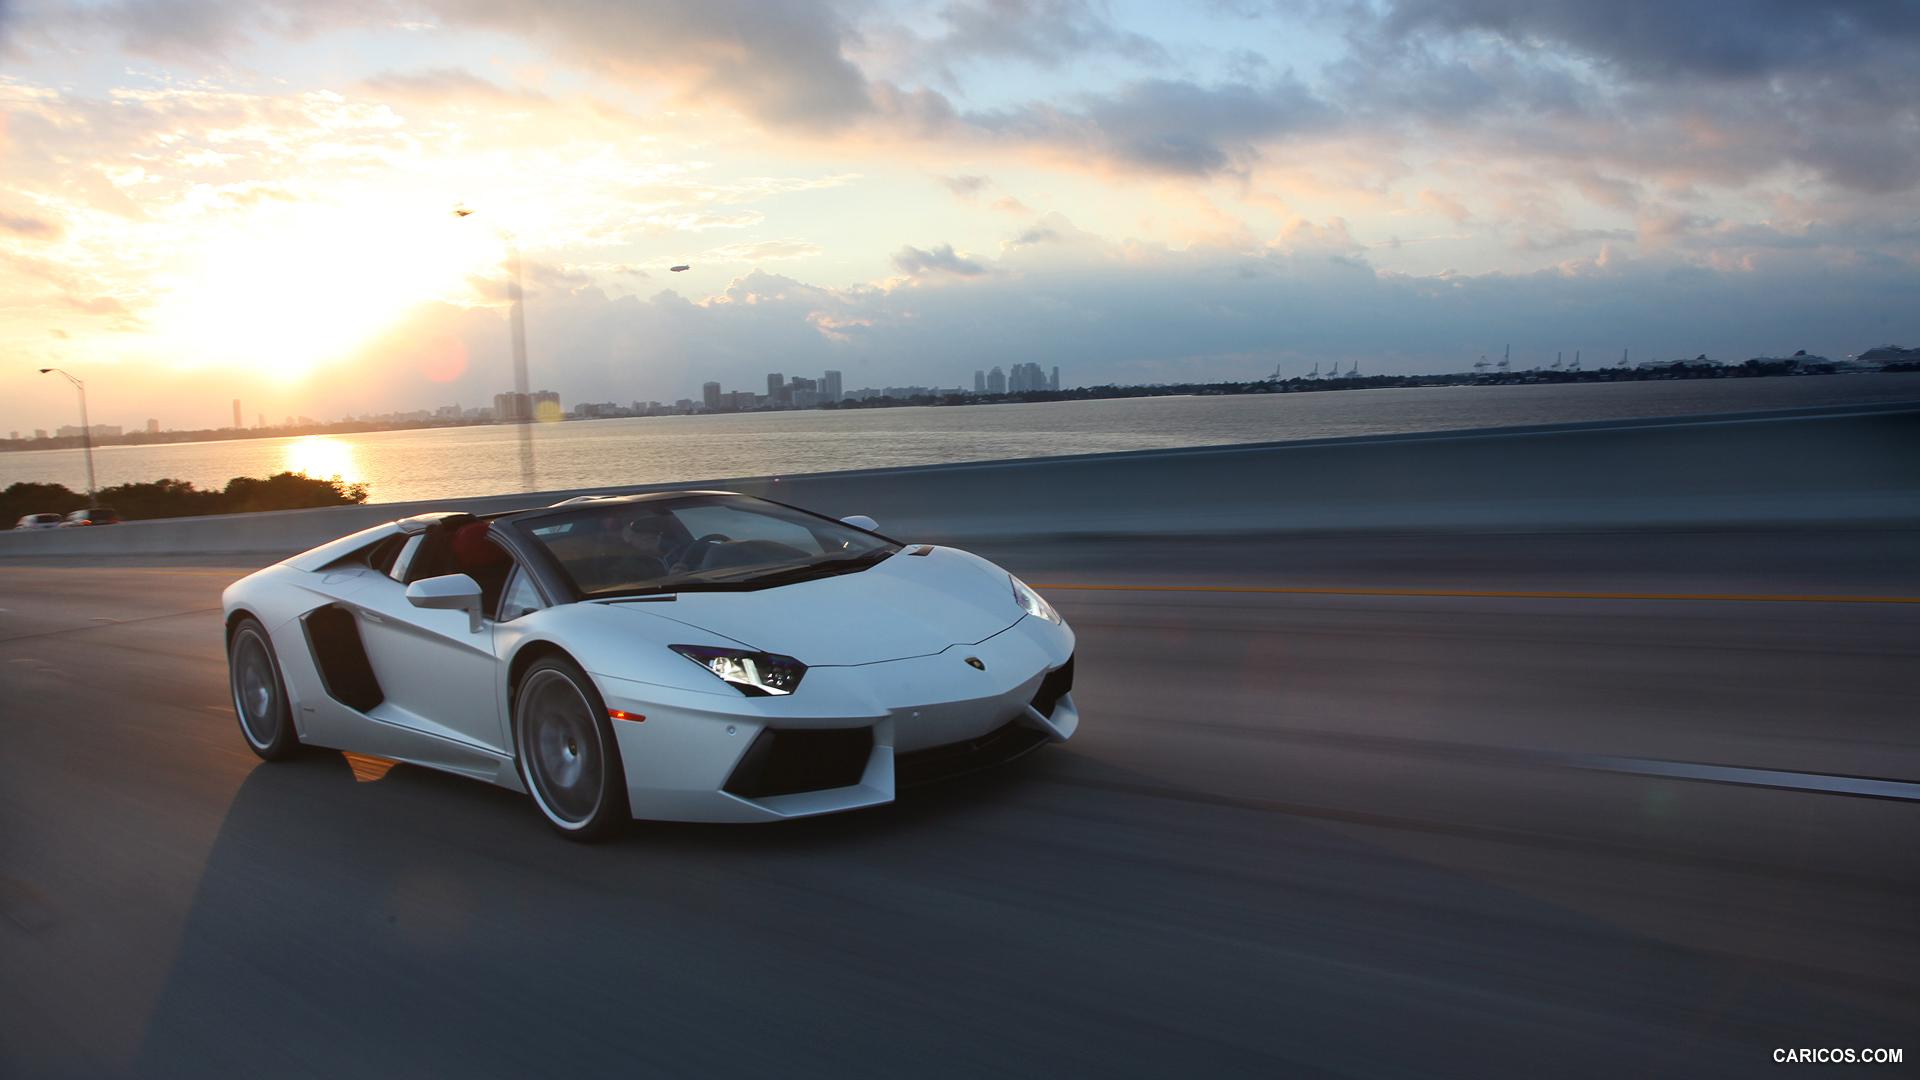 lamborghini aventador lp 700 4 roadster photo 109618 lamborghini aventador wallpaper hd 1920x1080 - Lamborghini Aventador Roadster Wallpaper Hd 19201080